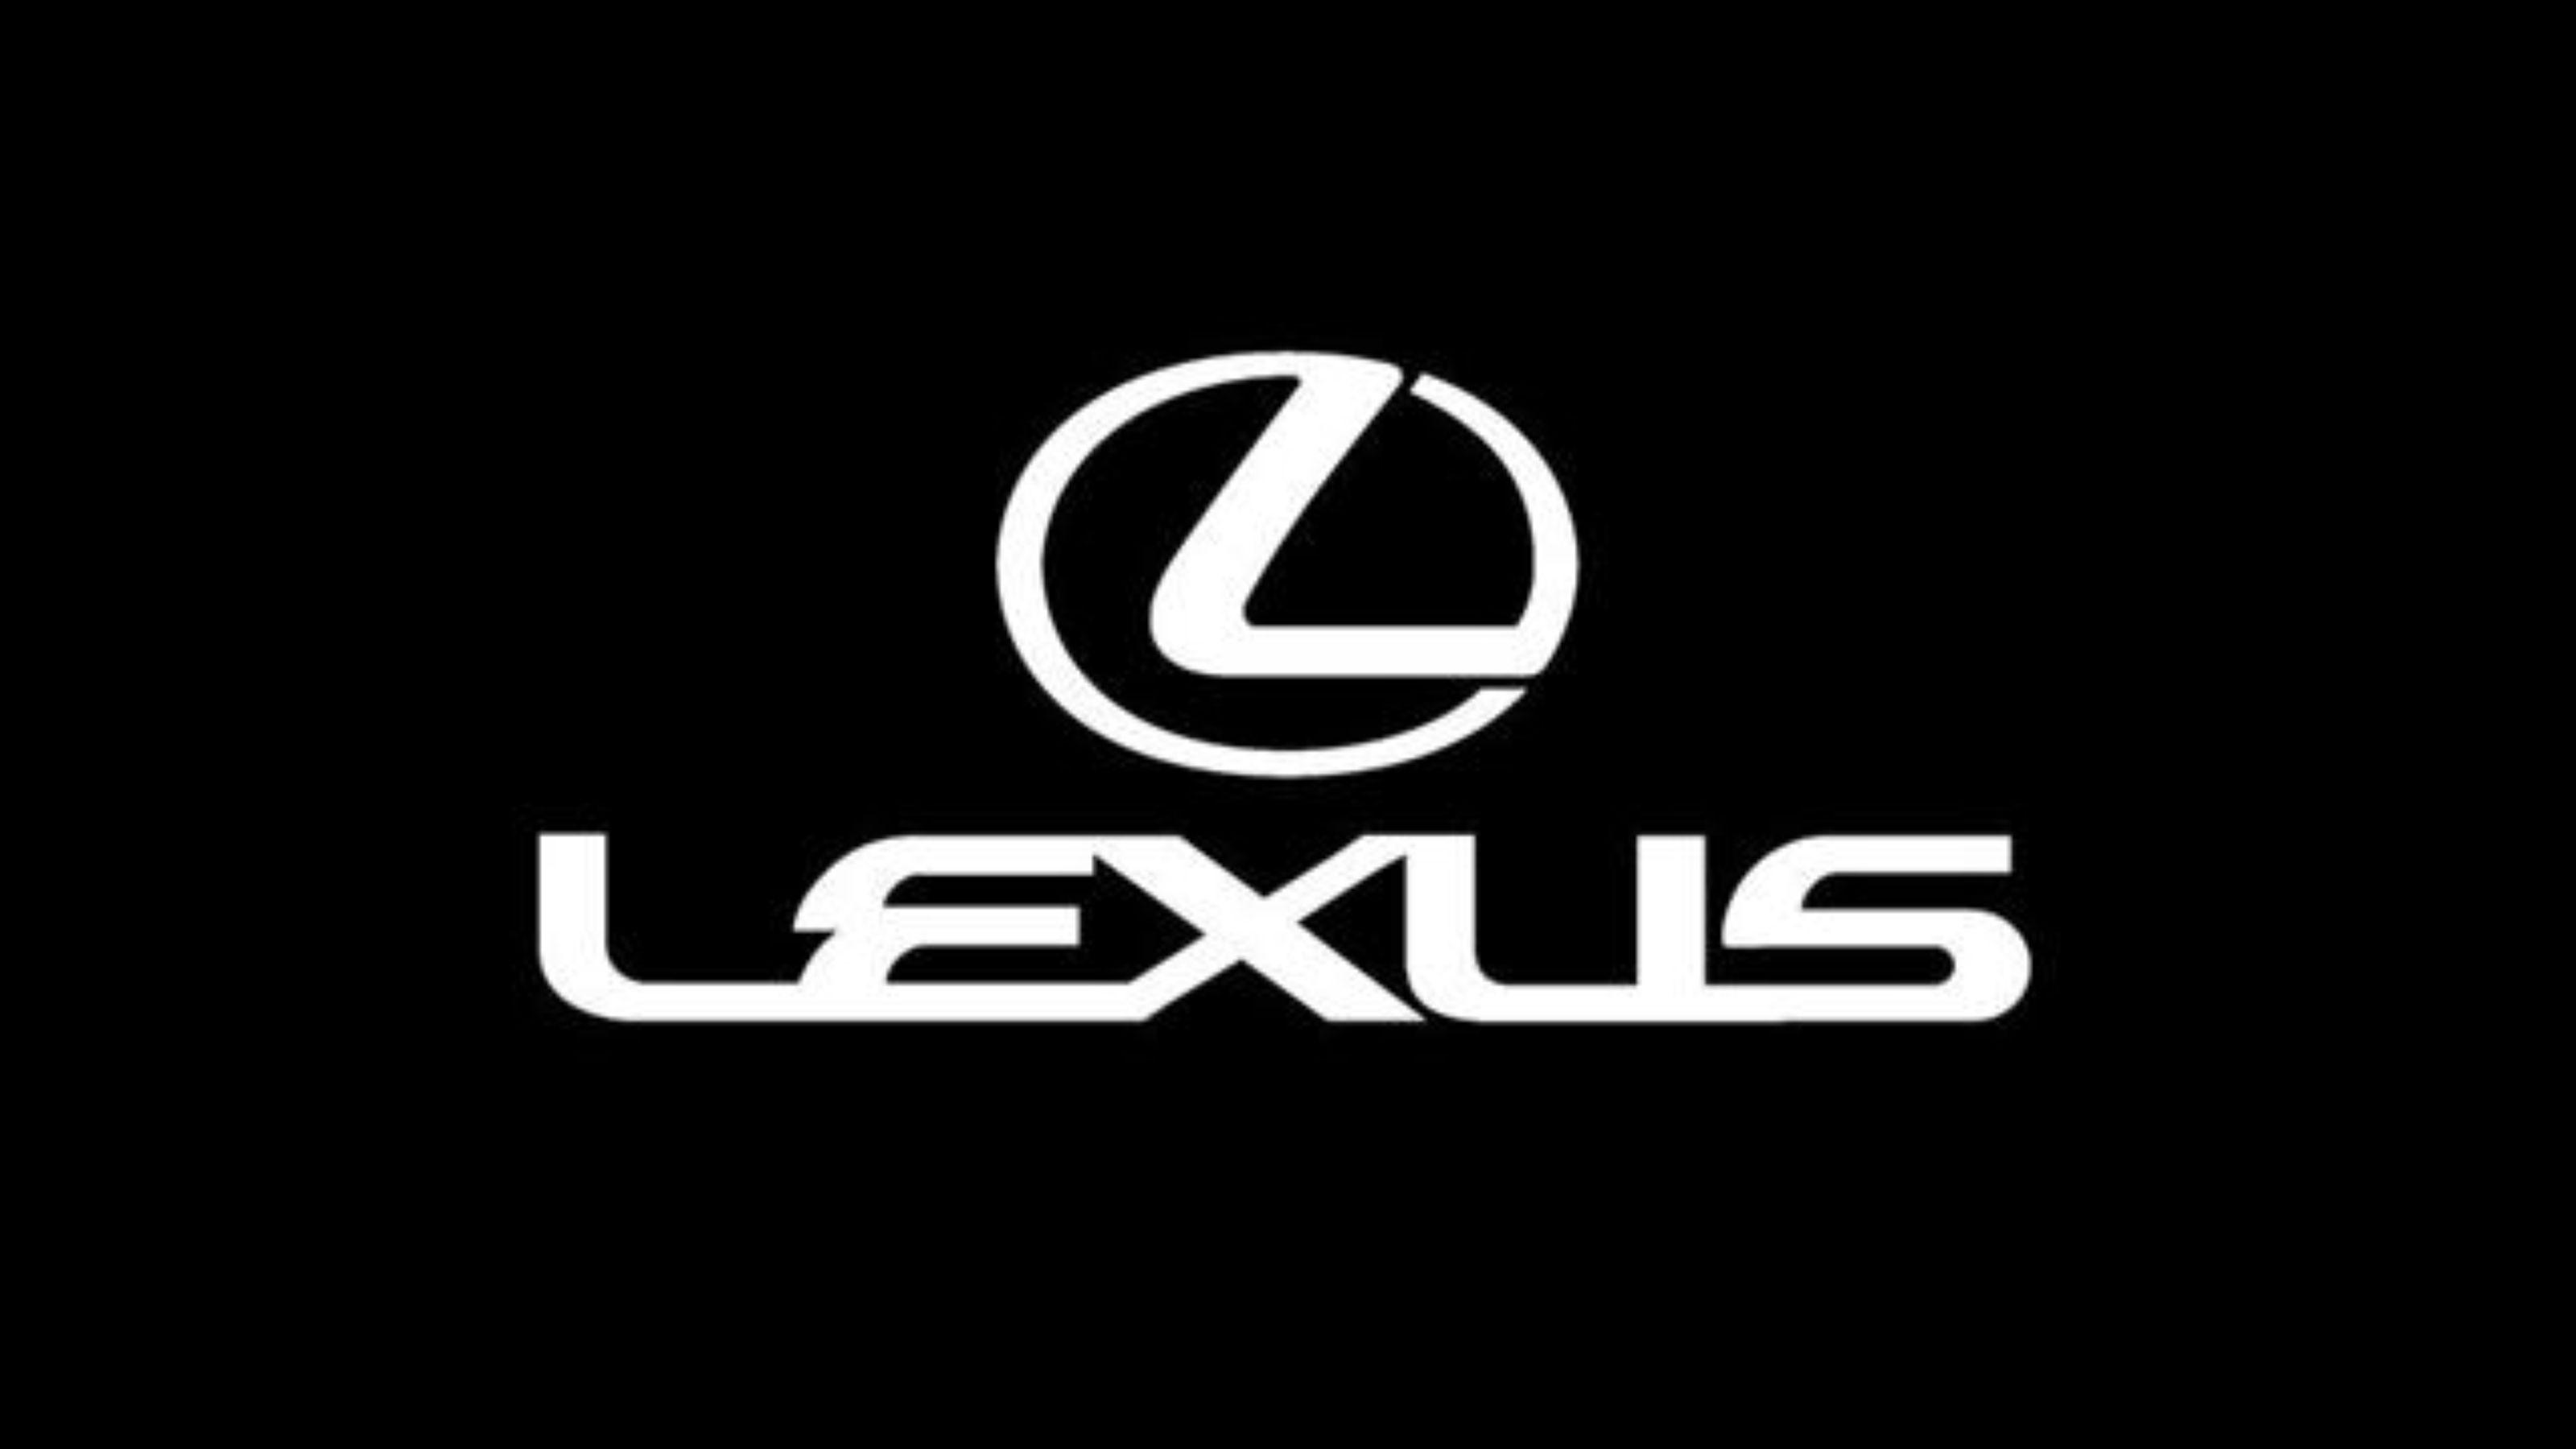 Lexus Central Sài Gòn